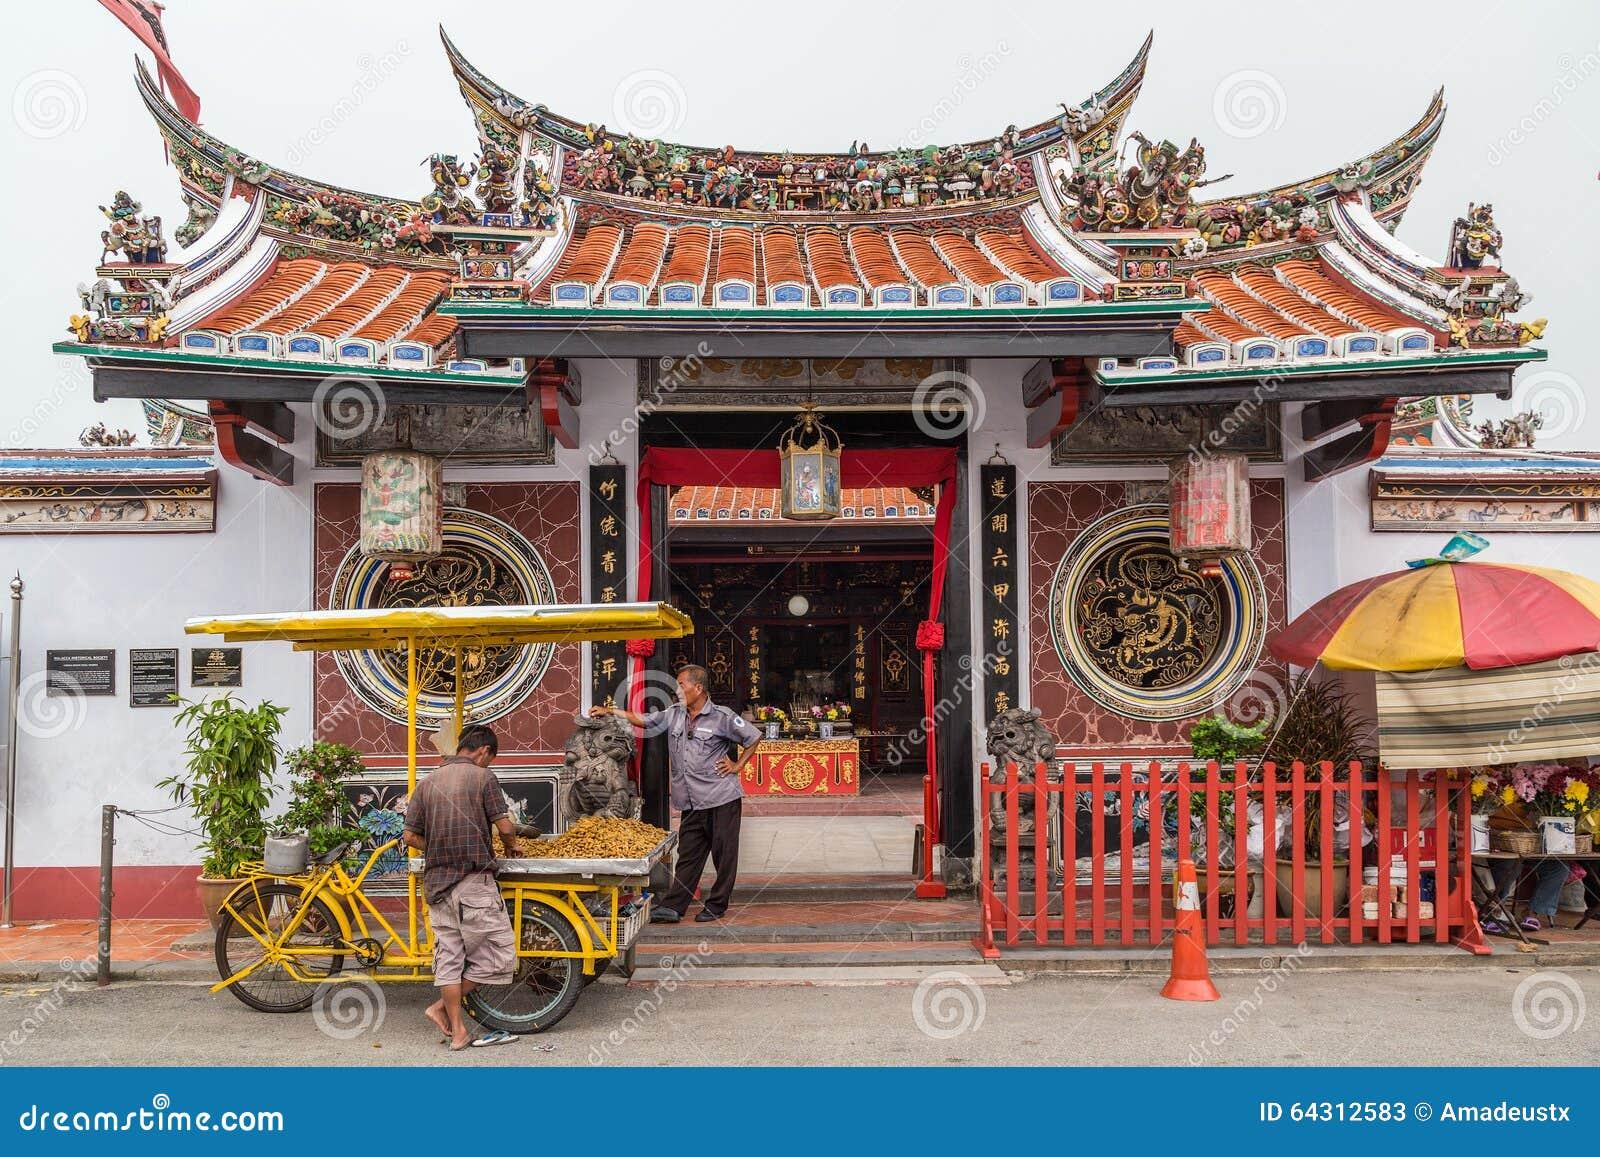 Georgetown, Penang/Malásia - cerca do outubro de 2015: Templo budista chinês de Cheng Hoon Teng em Georgetown, Penang, Malásia